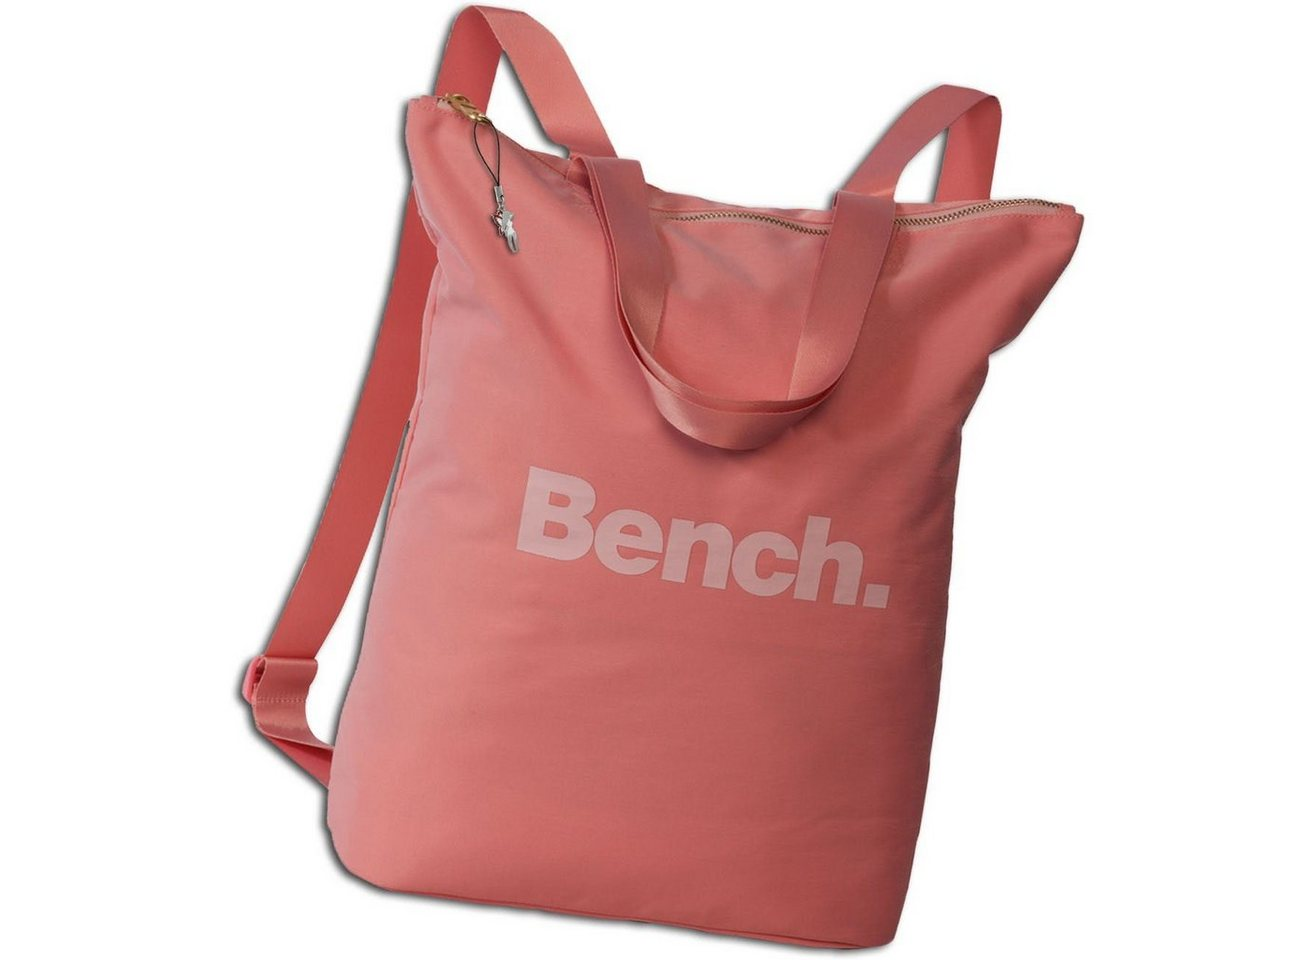 bench. -  Cityrucksack »ORI303X Bench Cityrucksack 30x40x13«, Damen, Jugend Cityrucksack, Henkeltasche Nylon, rosa, altrosa